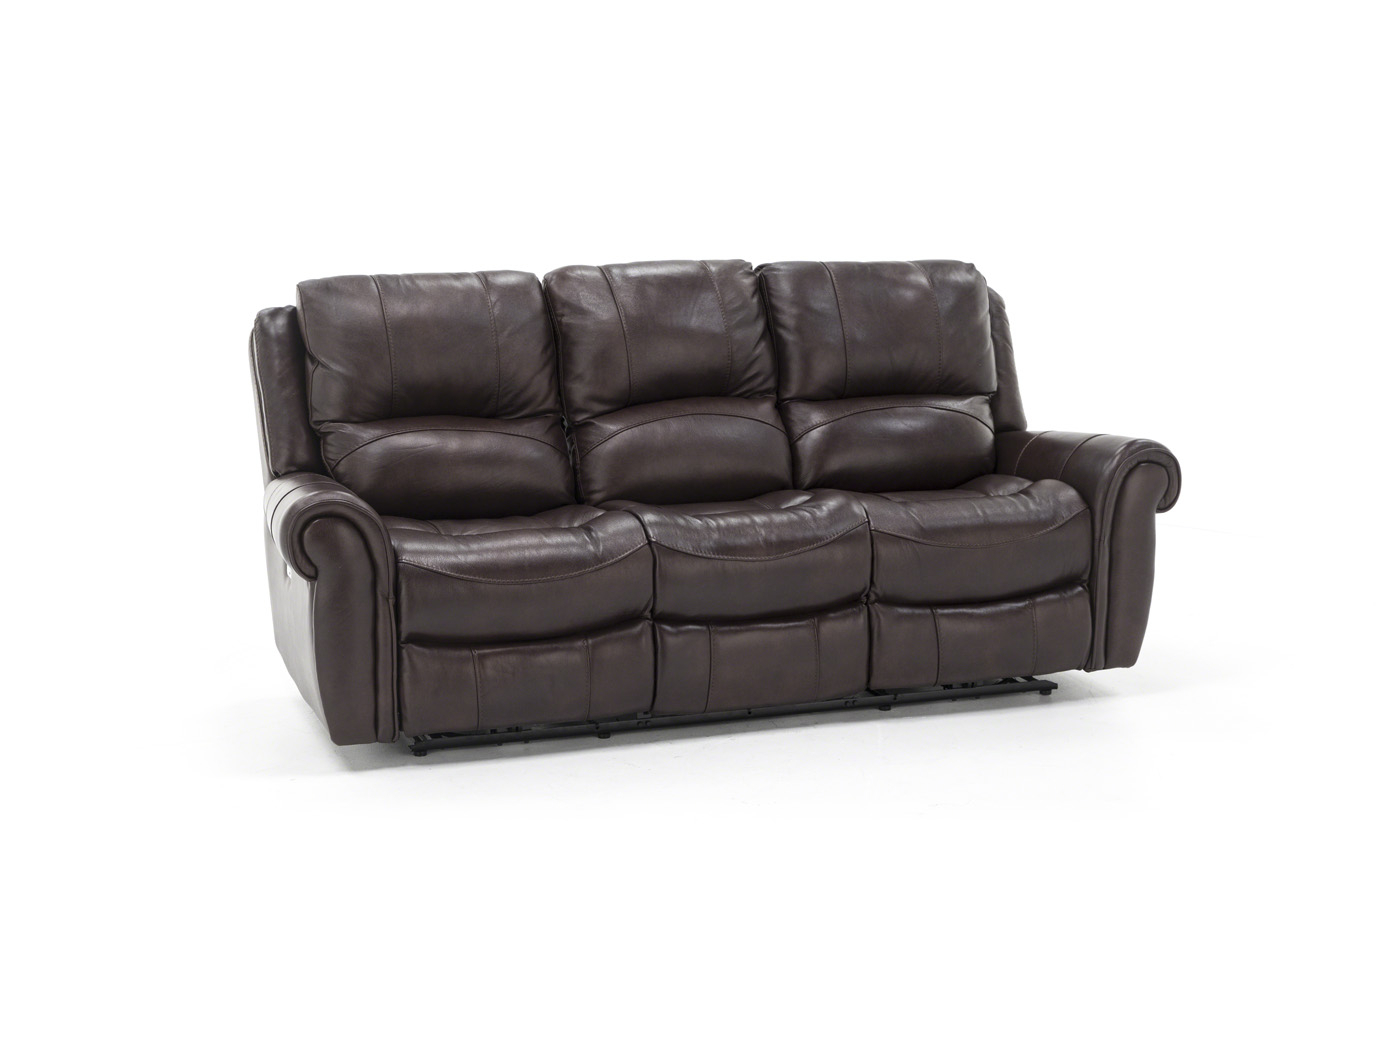 Living Room – Sofas | Steinhafels Regarding Lucy Dark Grey Sofa Chairs (Image 14 of 25)